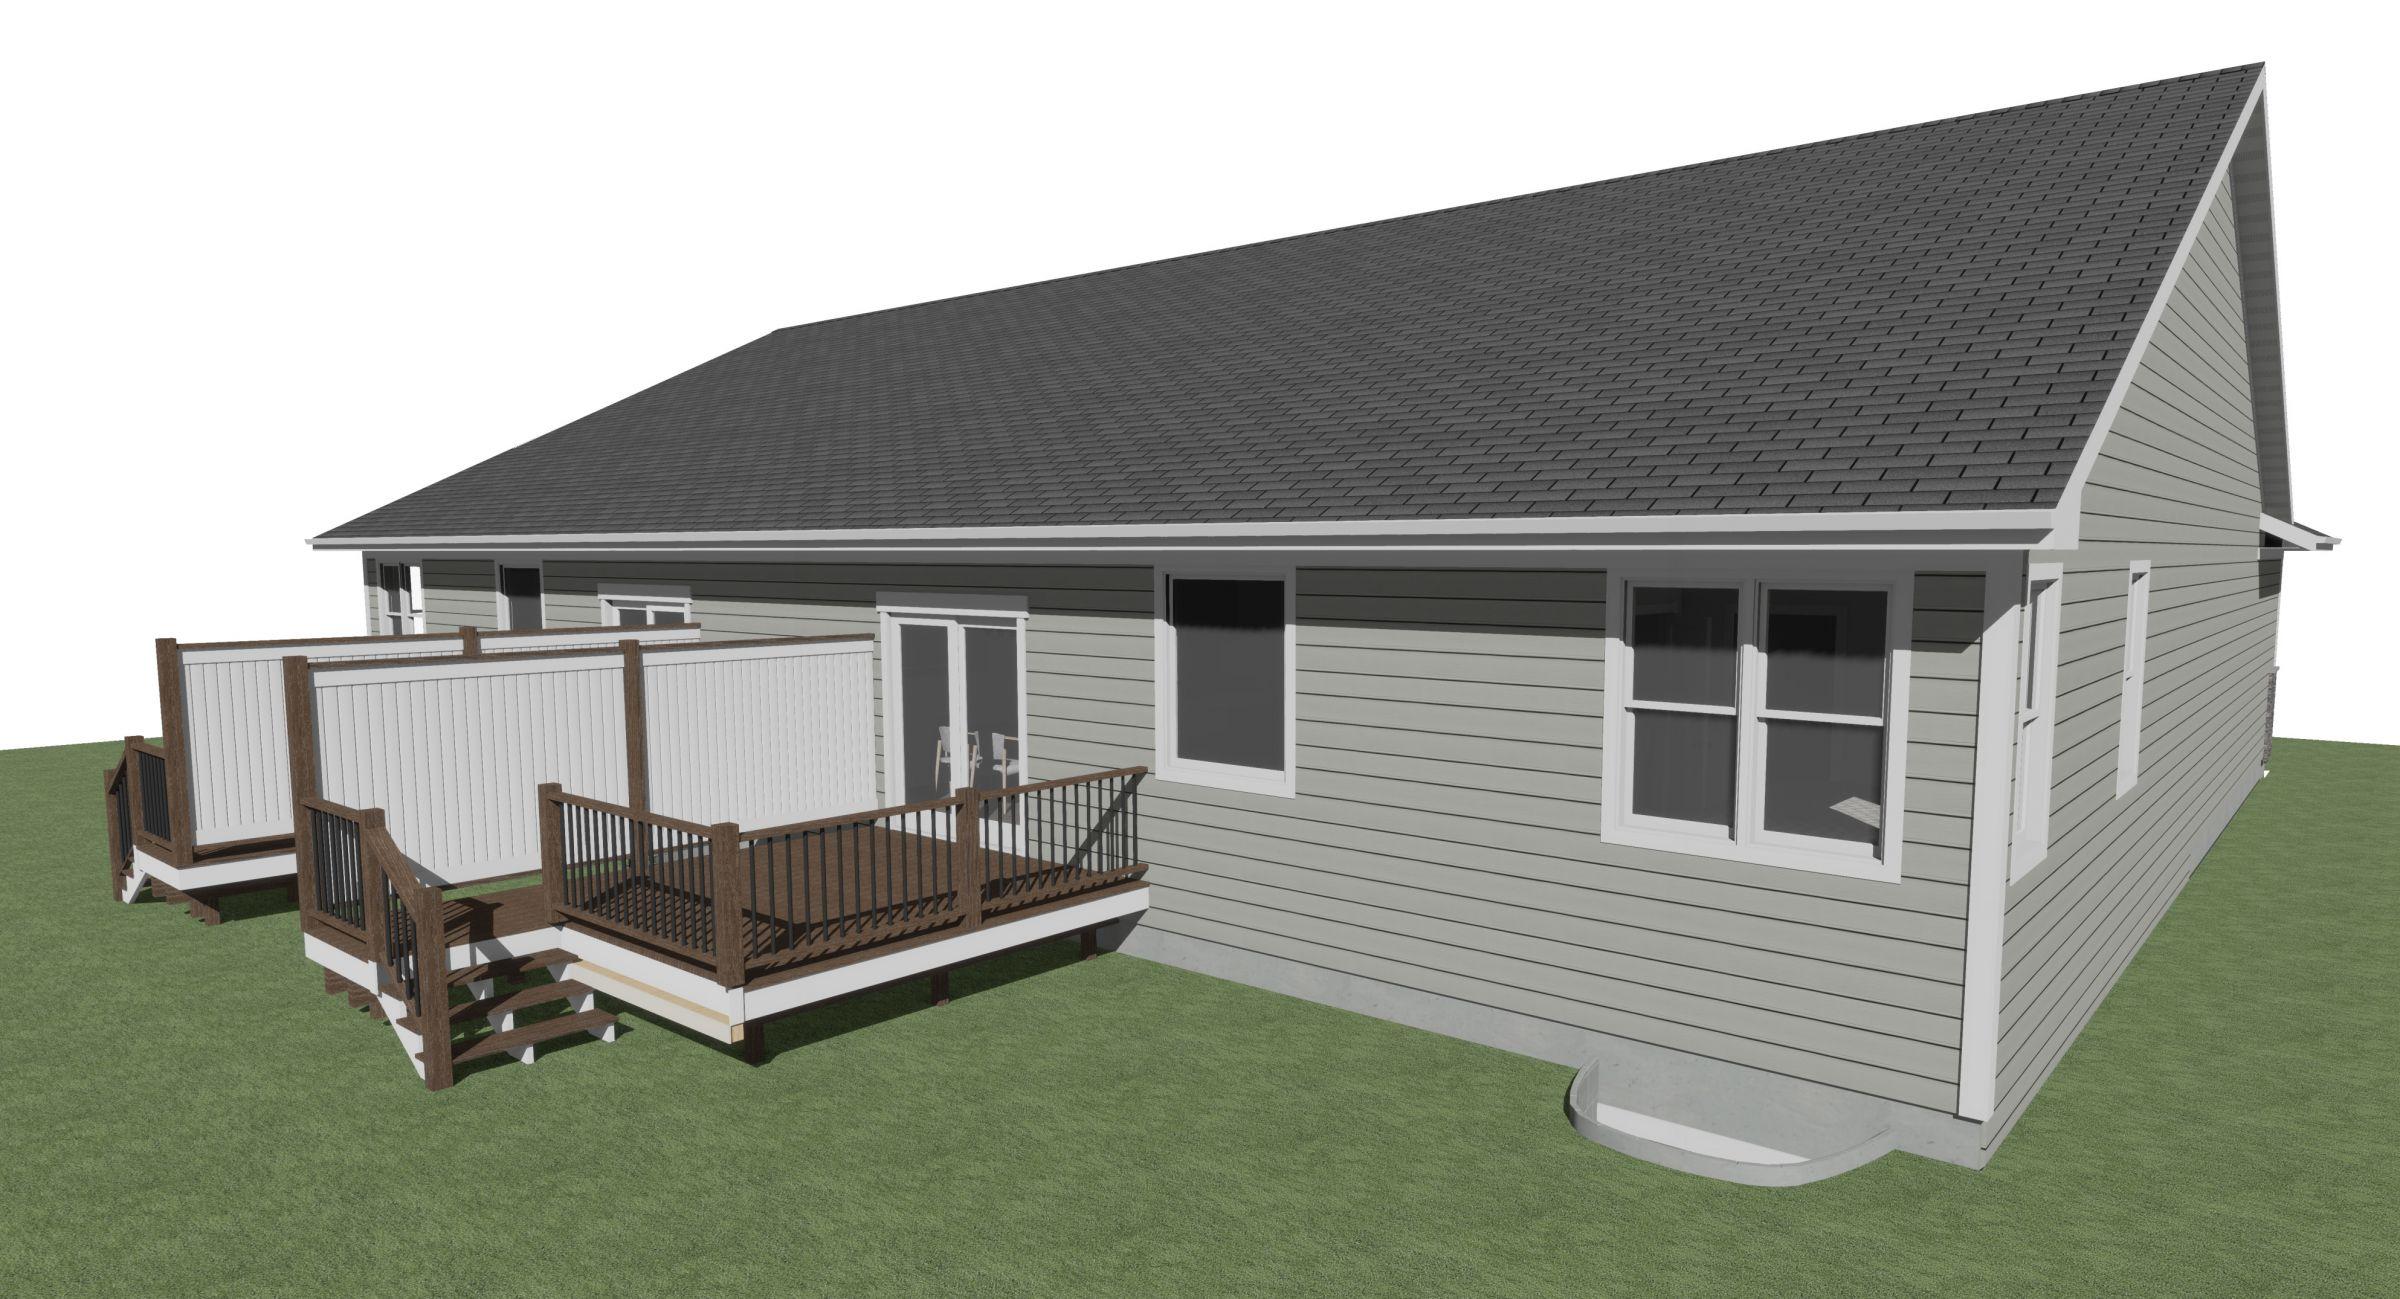 residential-warren-county-iowa-0-acres-listing-number-15420-0-2021-03-26-142430.jpg